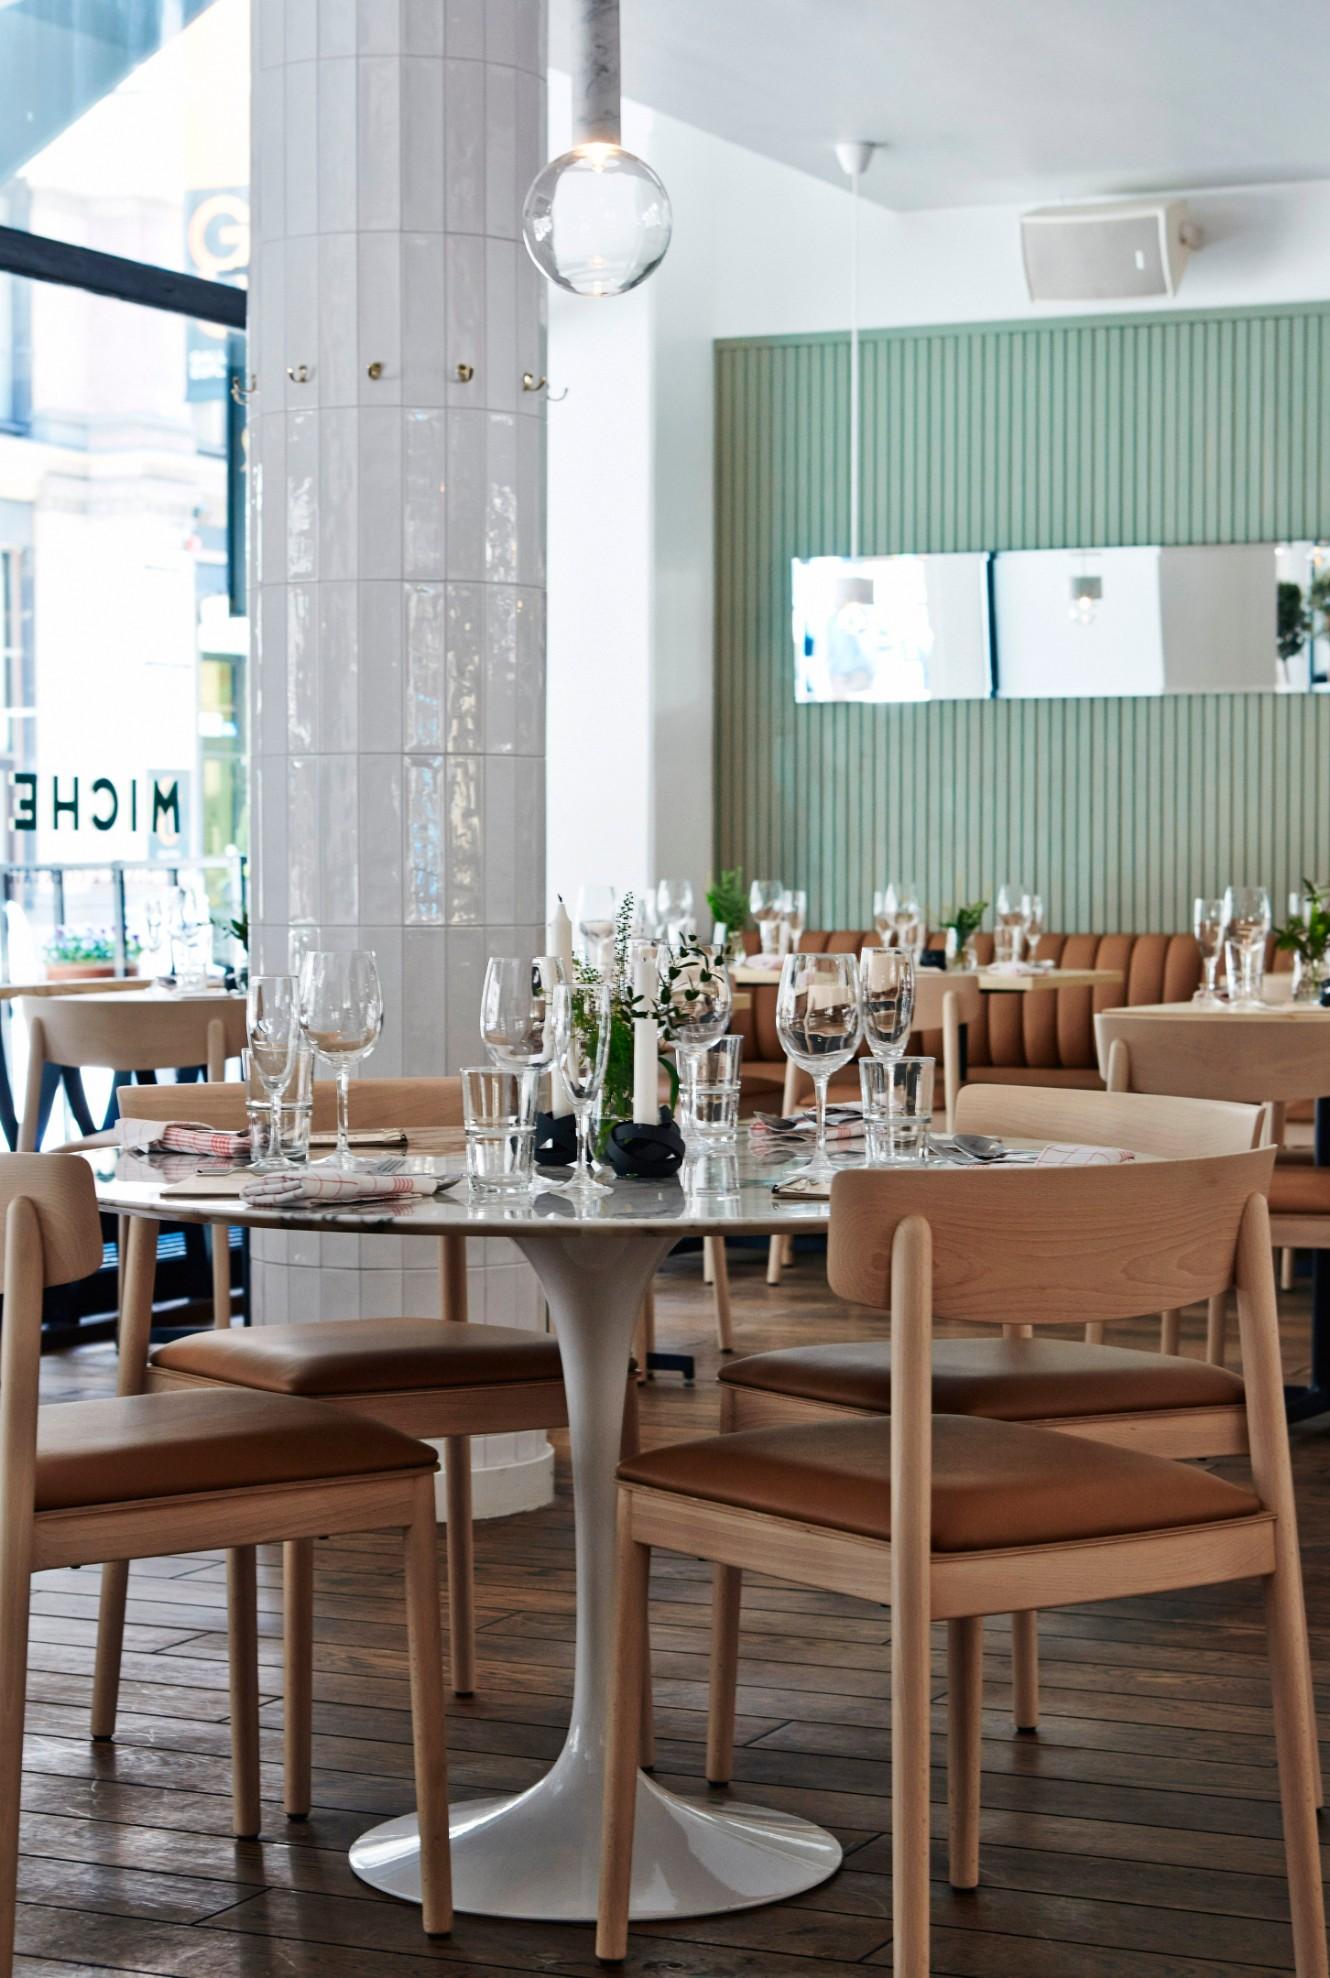 This Luxury Restaurant Design Is Inspired By 1940s Kiosks